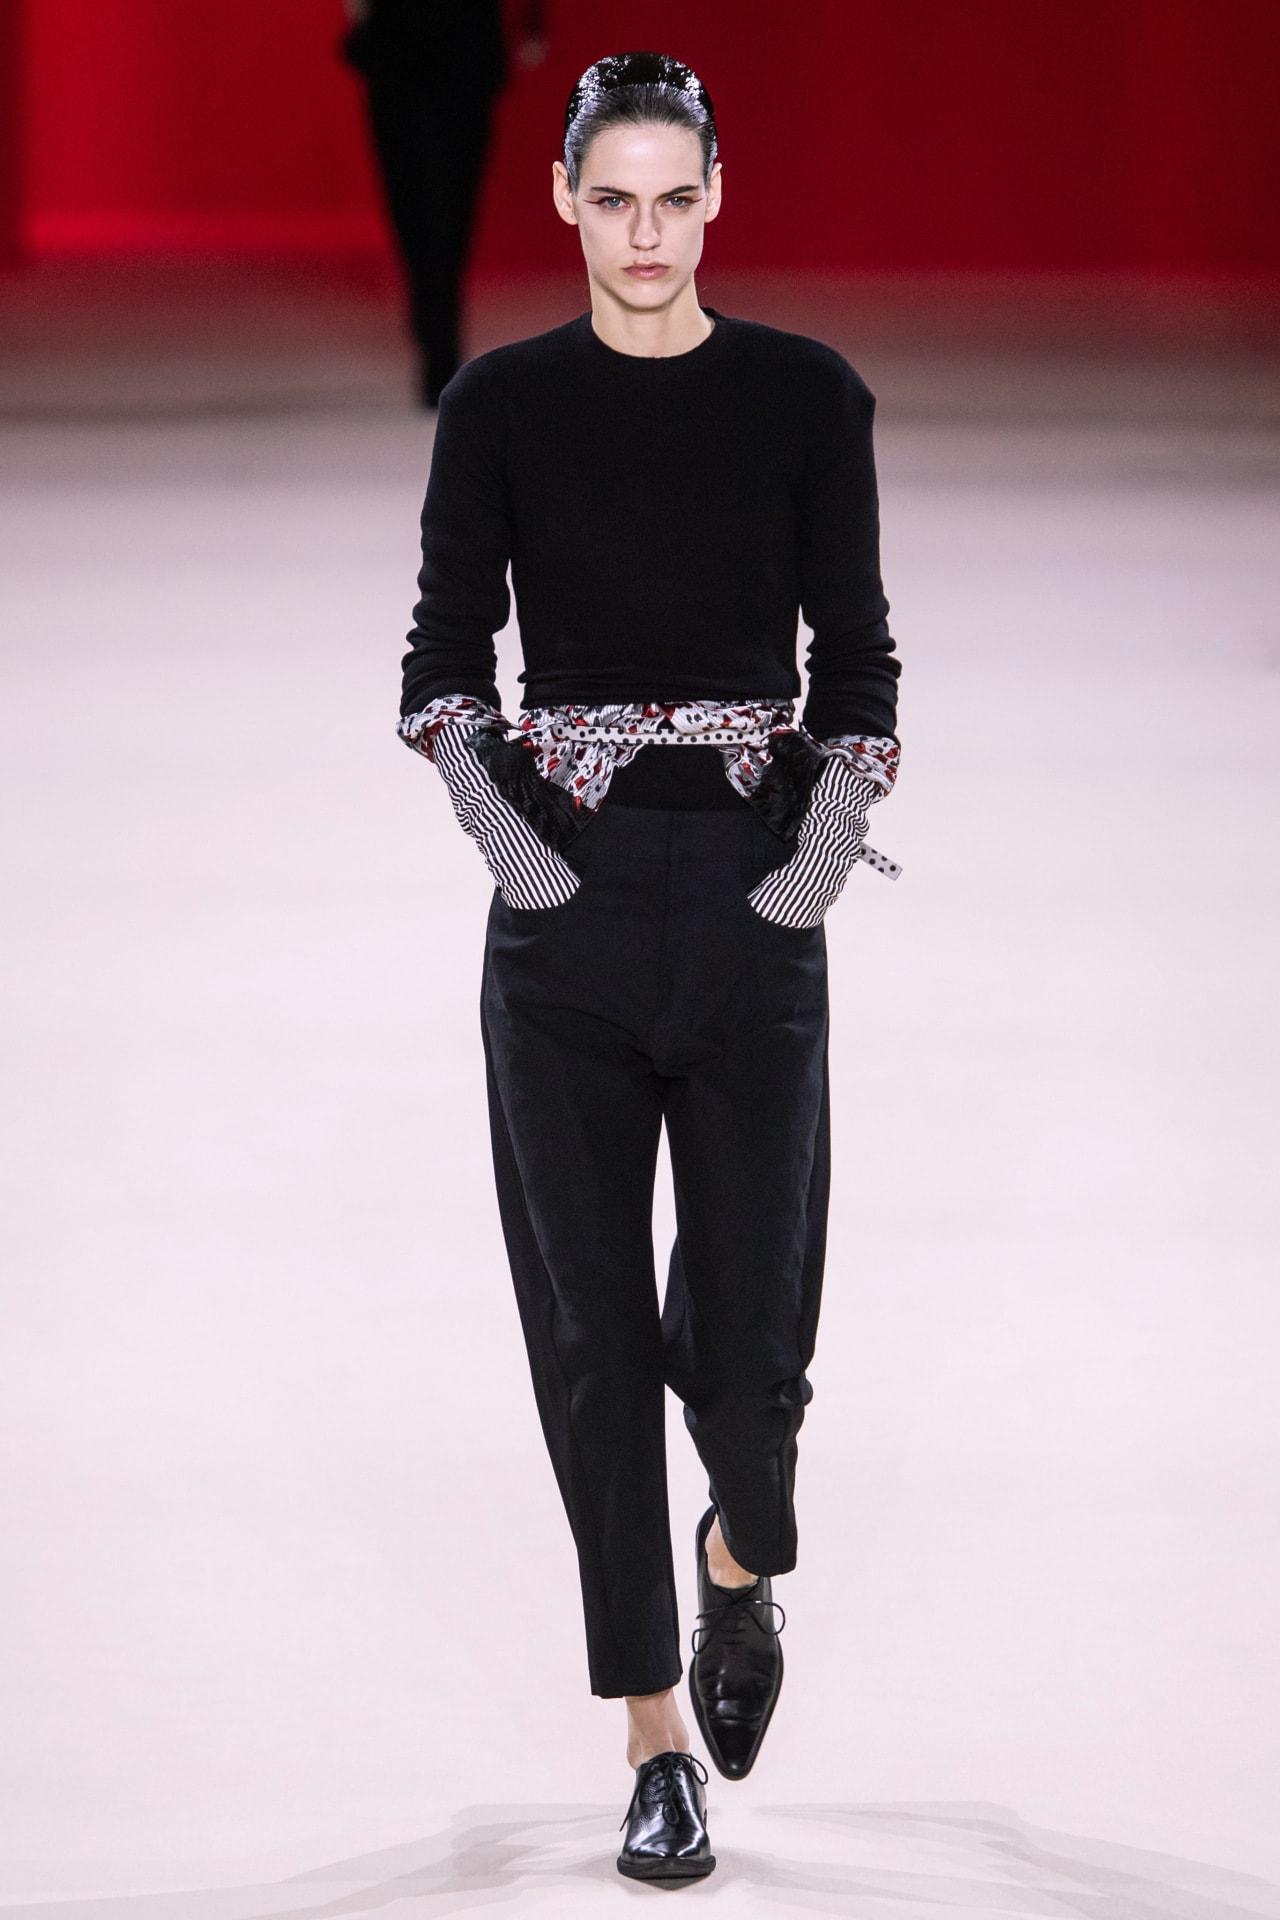 Haider Ackermann ready-to-wear autumn/winter '19/'20